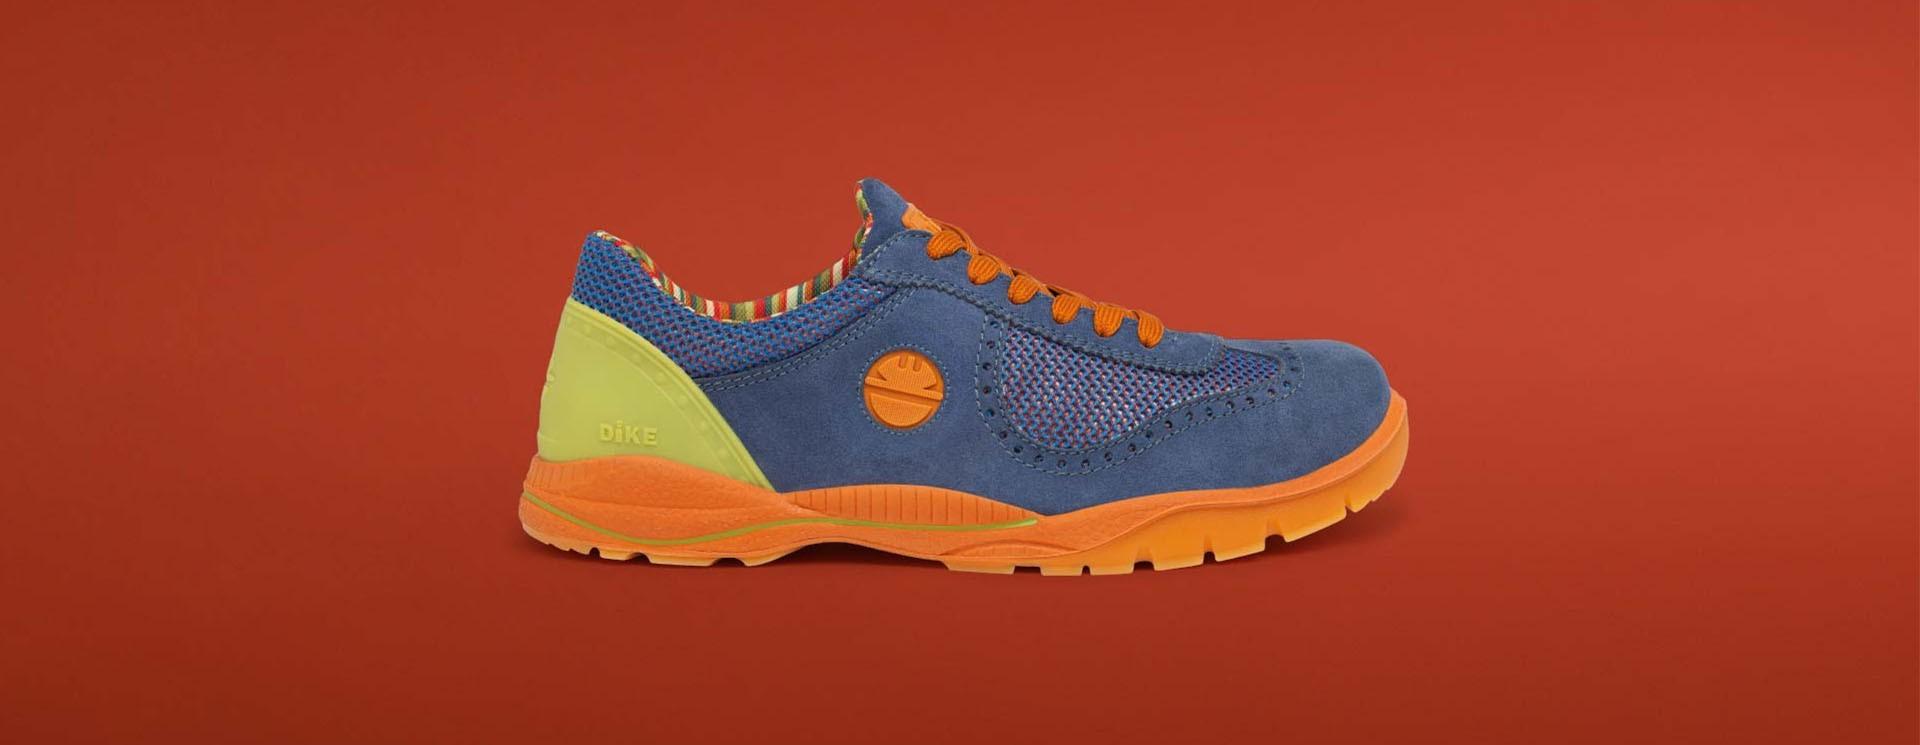 Jumper: Saffety Shoes | Dike